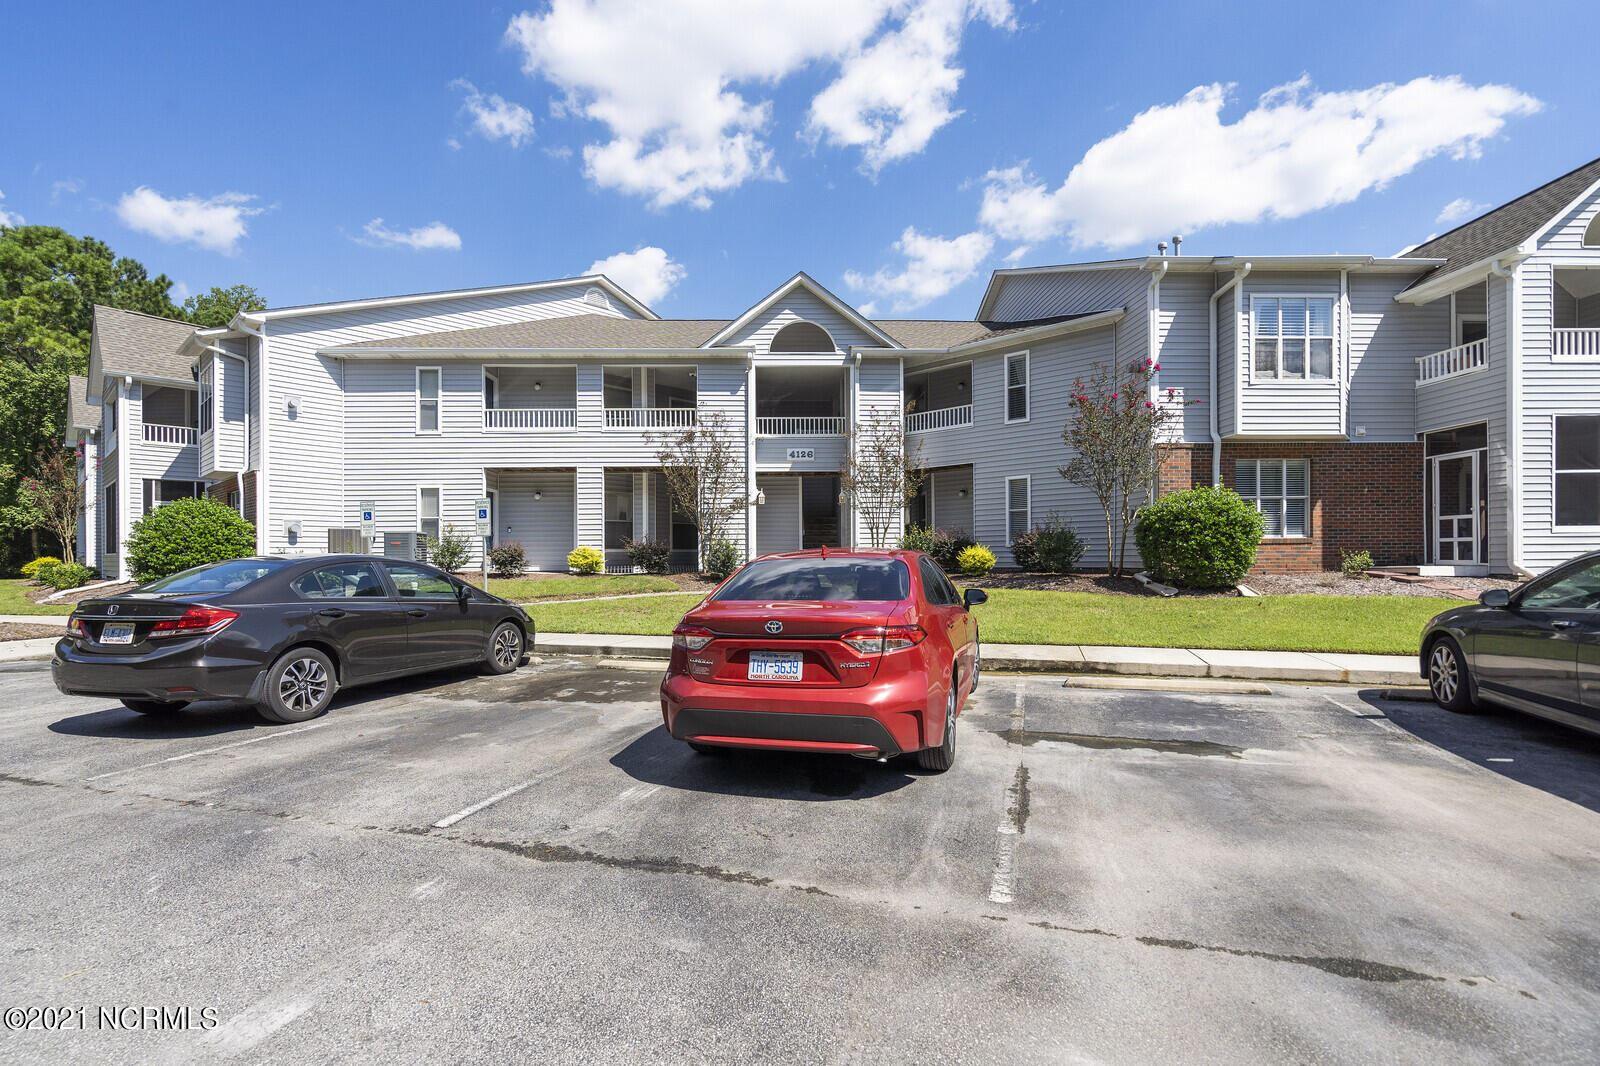 Photo of 4126 Breezewood Drive #202, Wilmington, NC 28412 (MLS # 100292964)